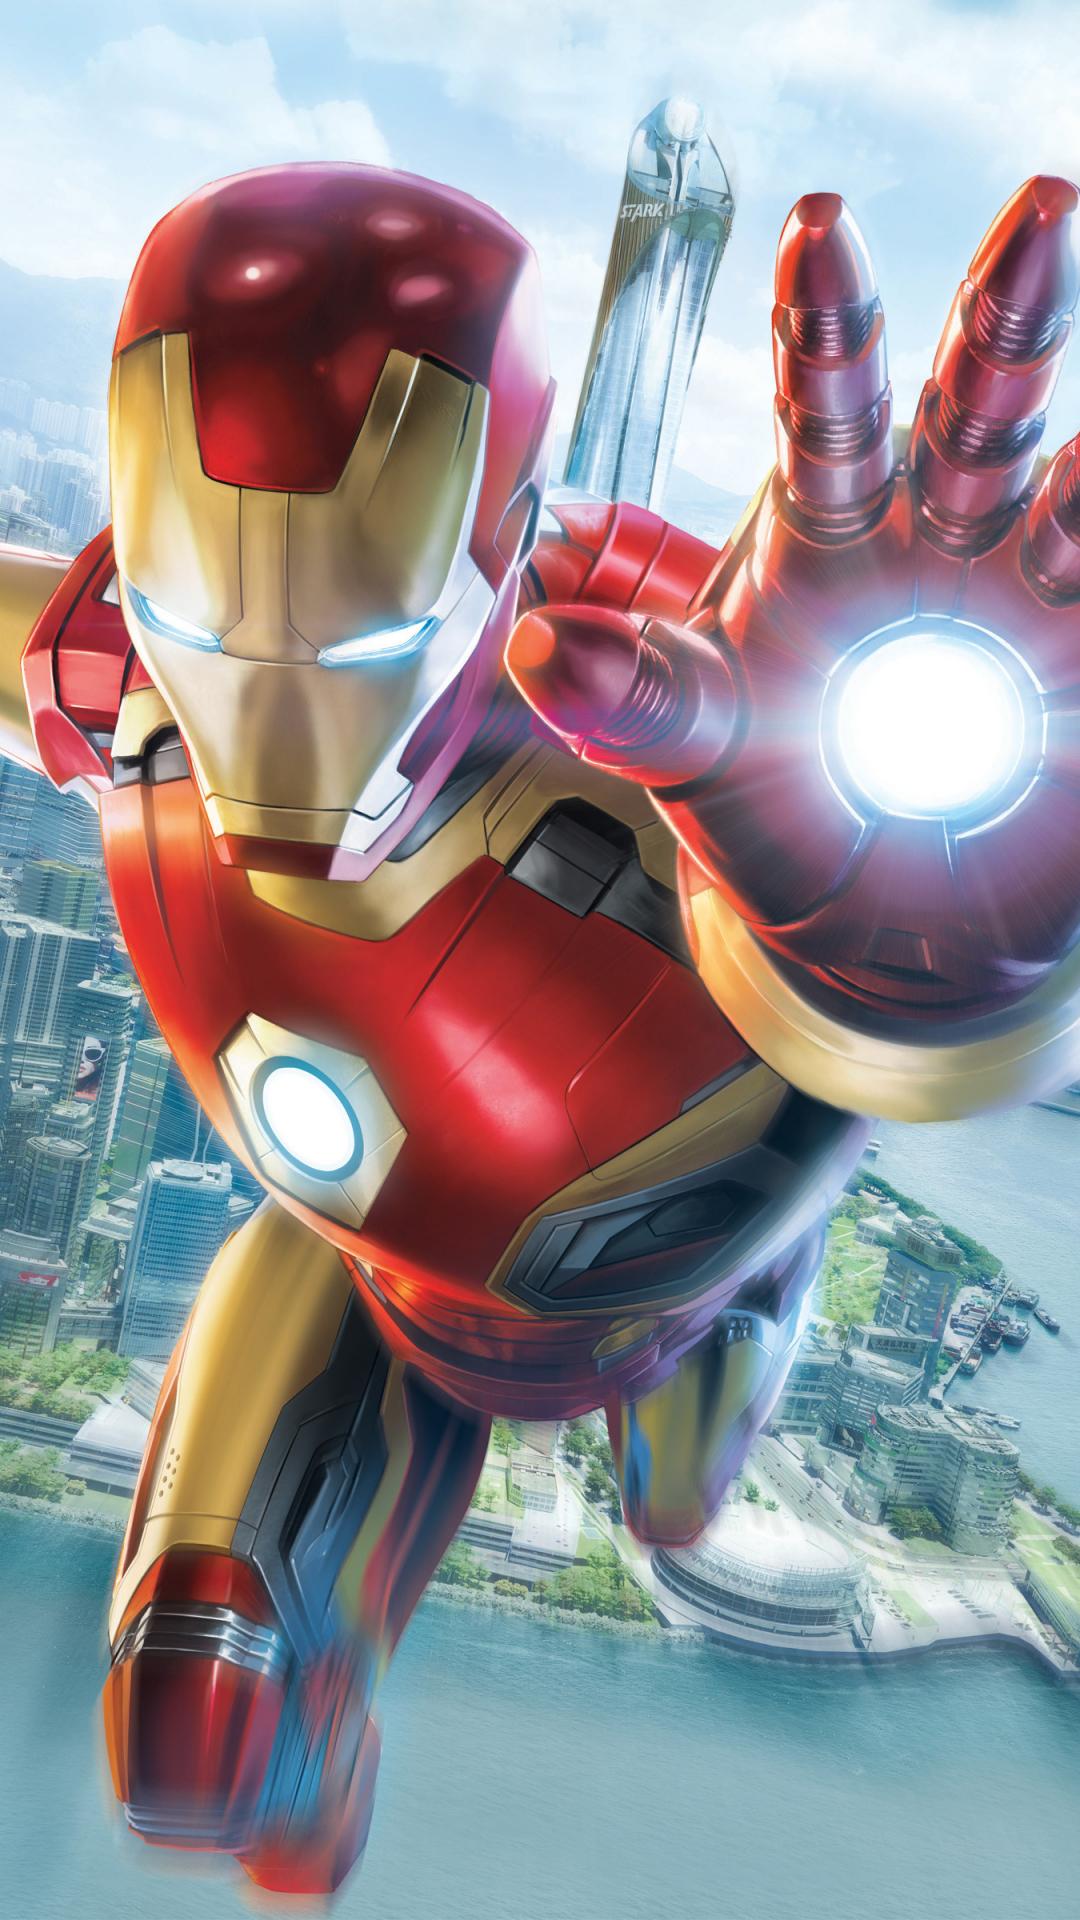 Download 1080x1920 Wallpaper Iron Man Experience Hong Kong